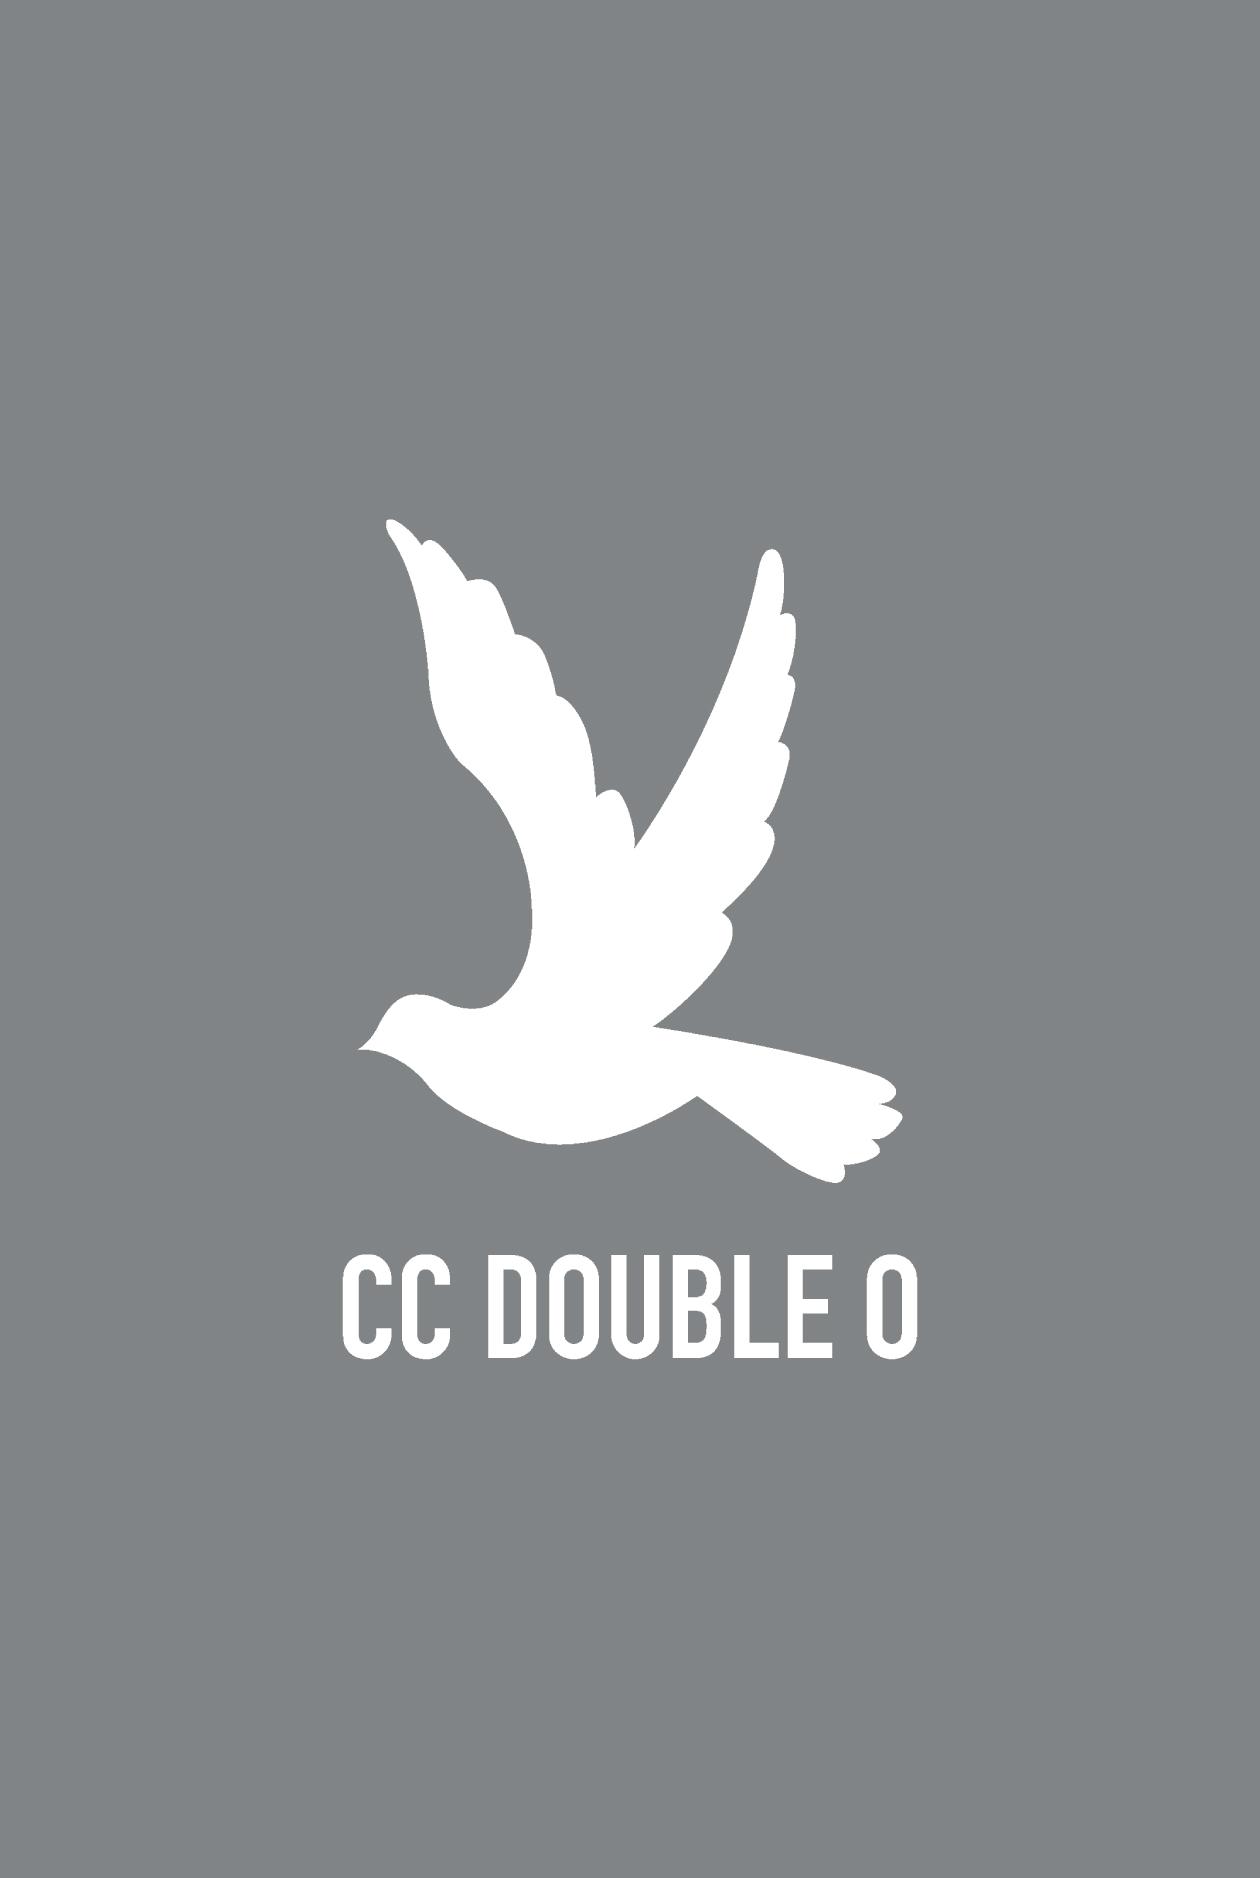 CC DOUBLE O Bifold Wallet